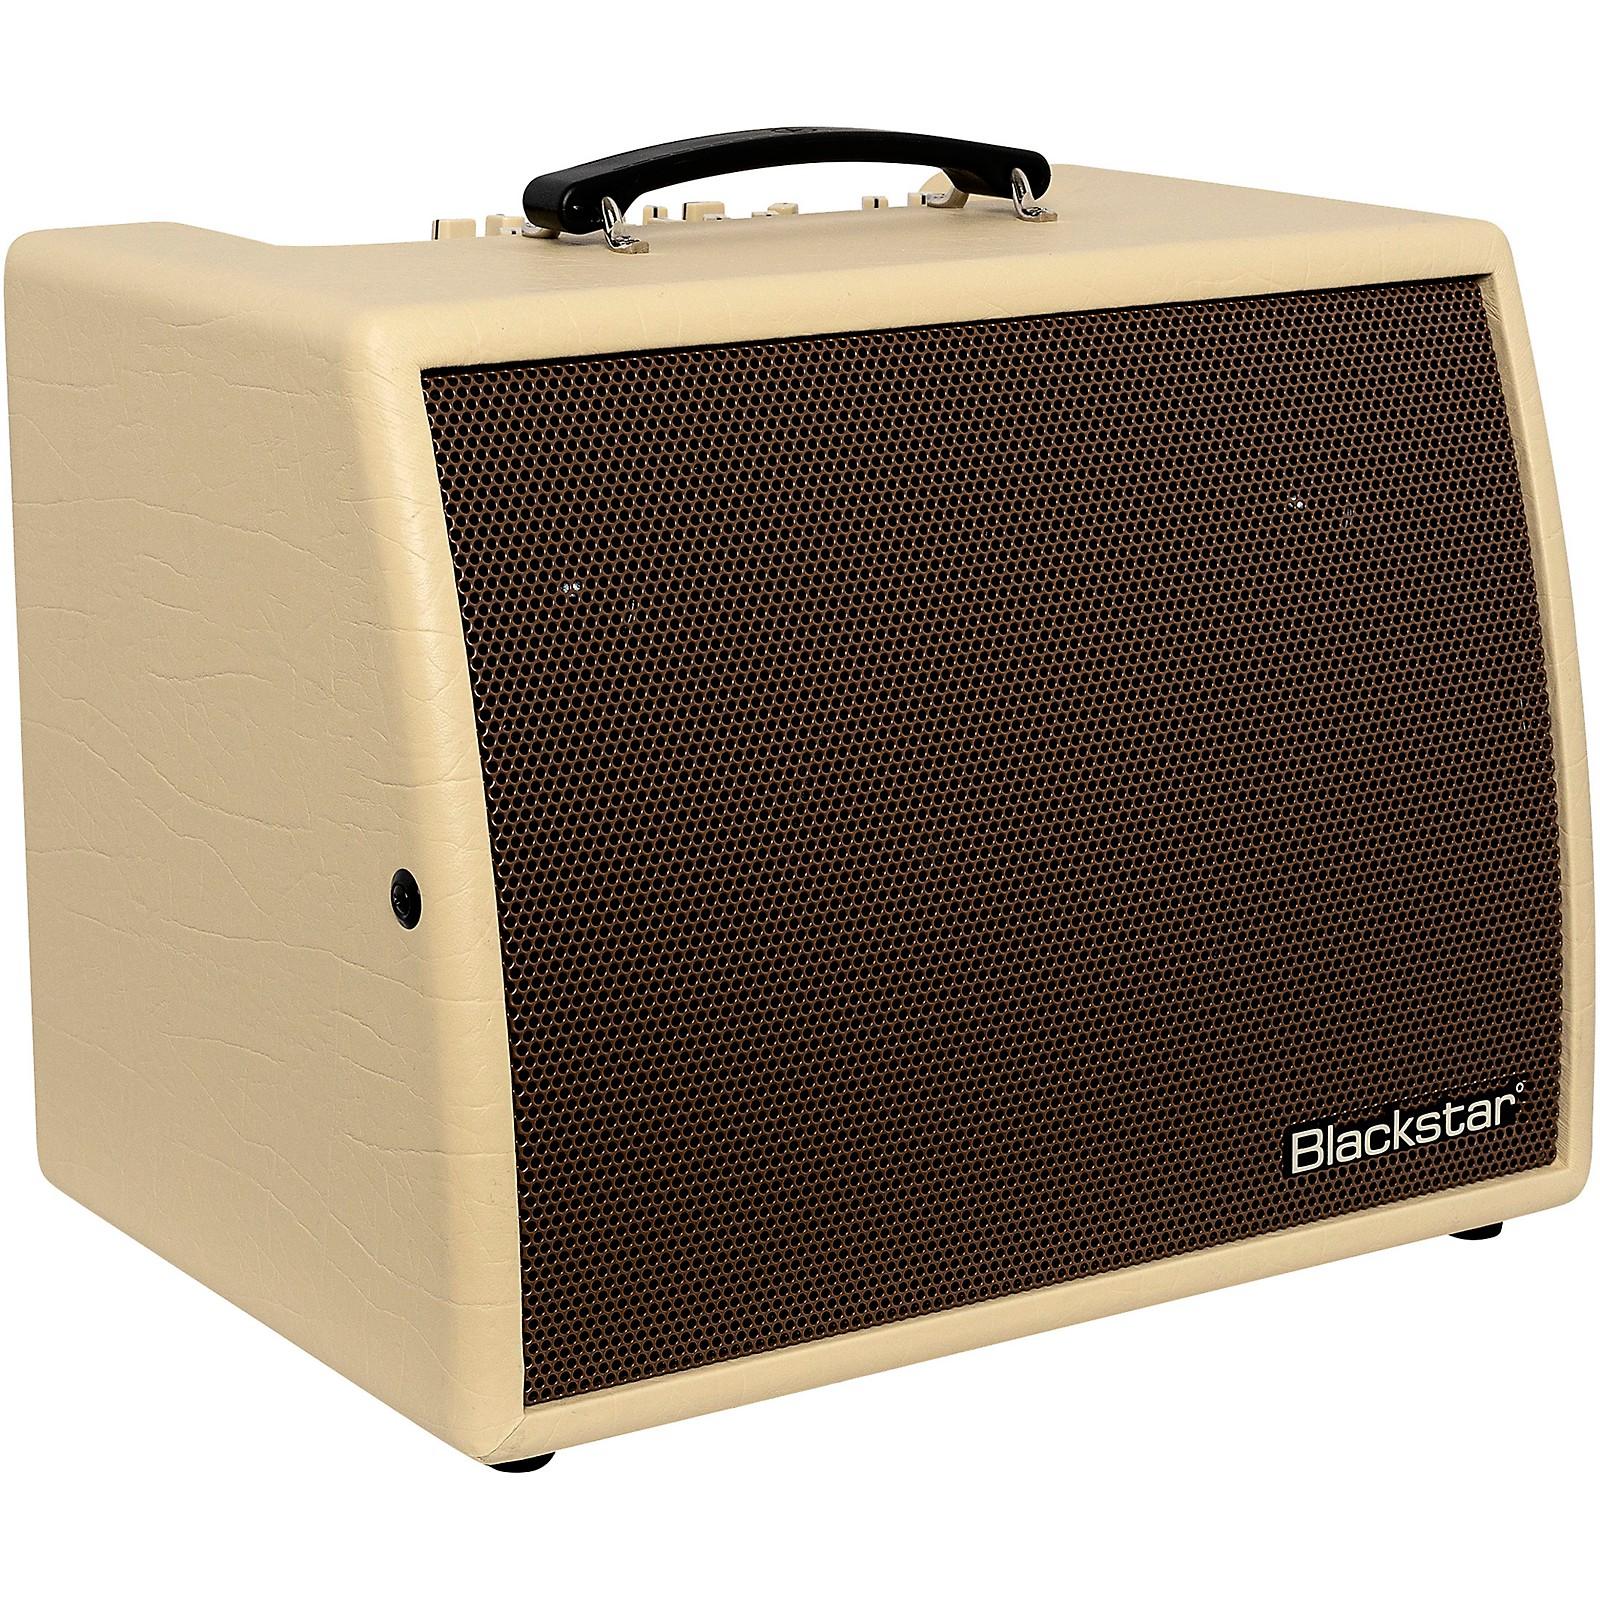 Open Box Blackstar Sonnet 120 120W 1x8 Acoustic Combo Amplifier